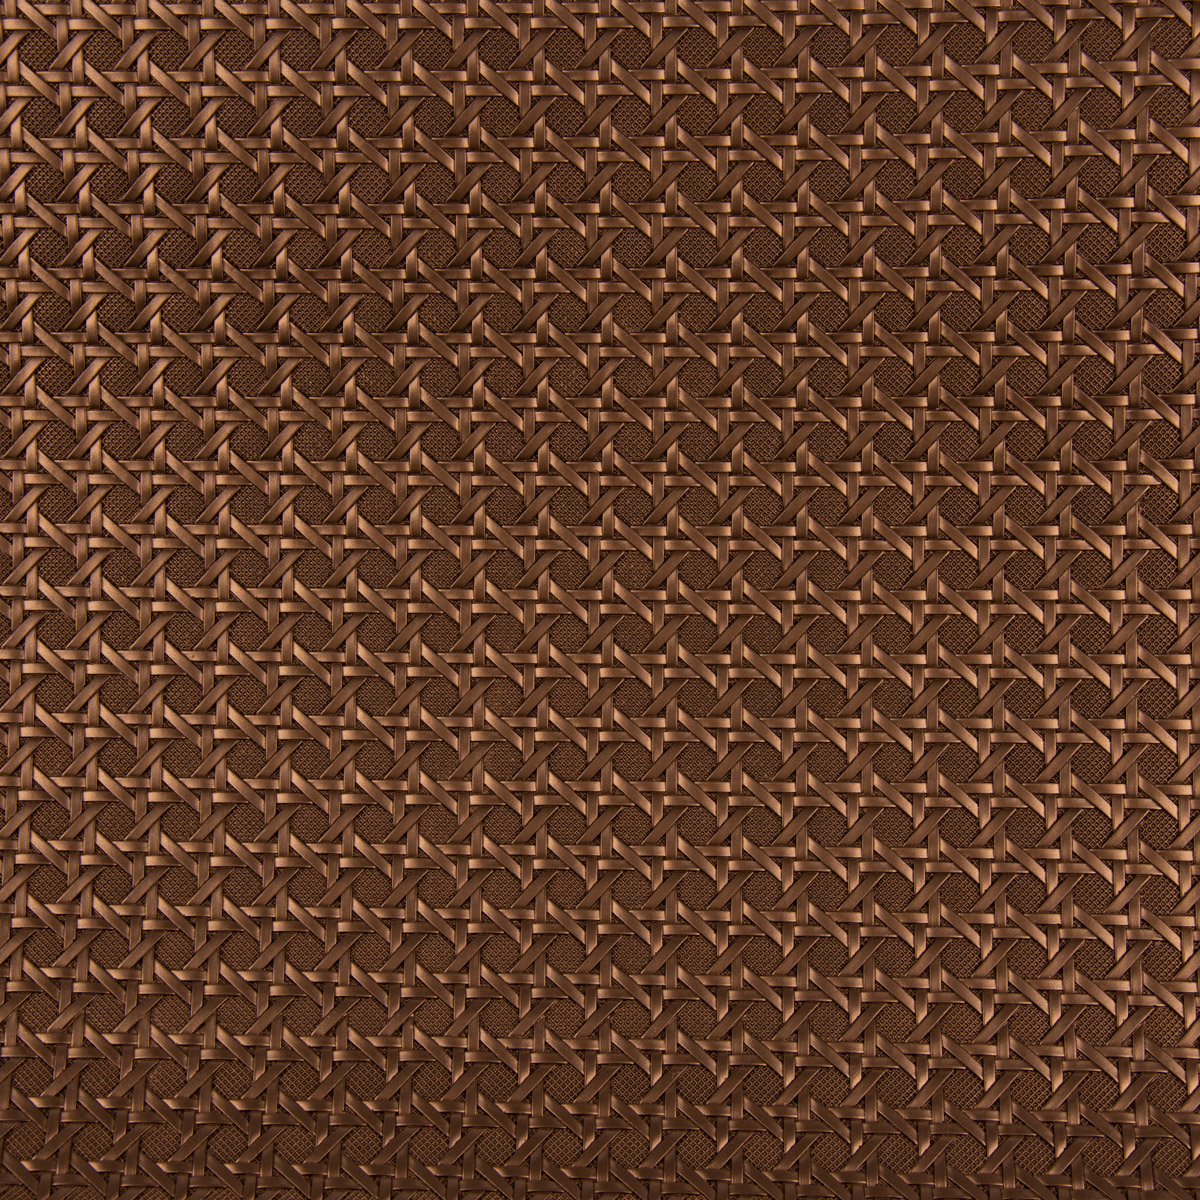 Kunstleder Lederimitat Struktur Geometrisch Relief bronze 1,4m Breite